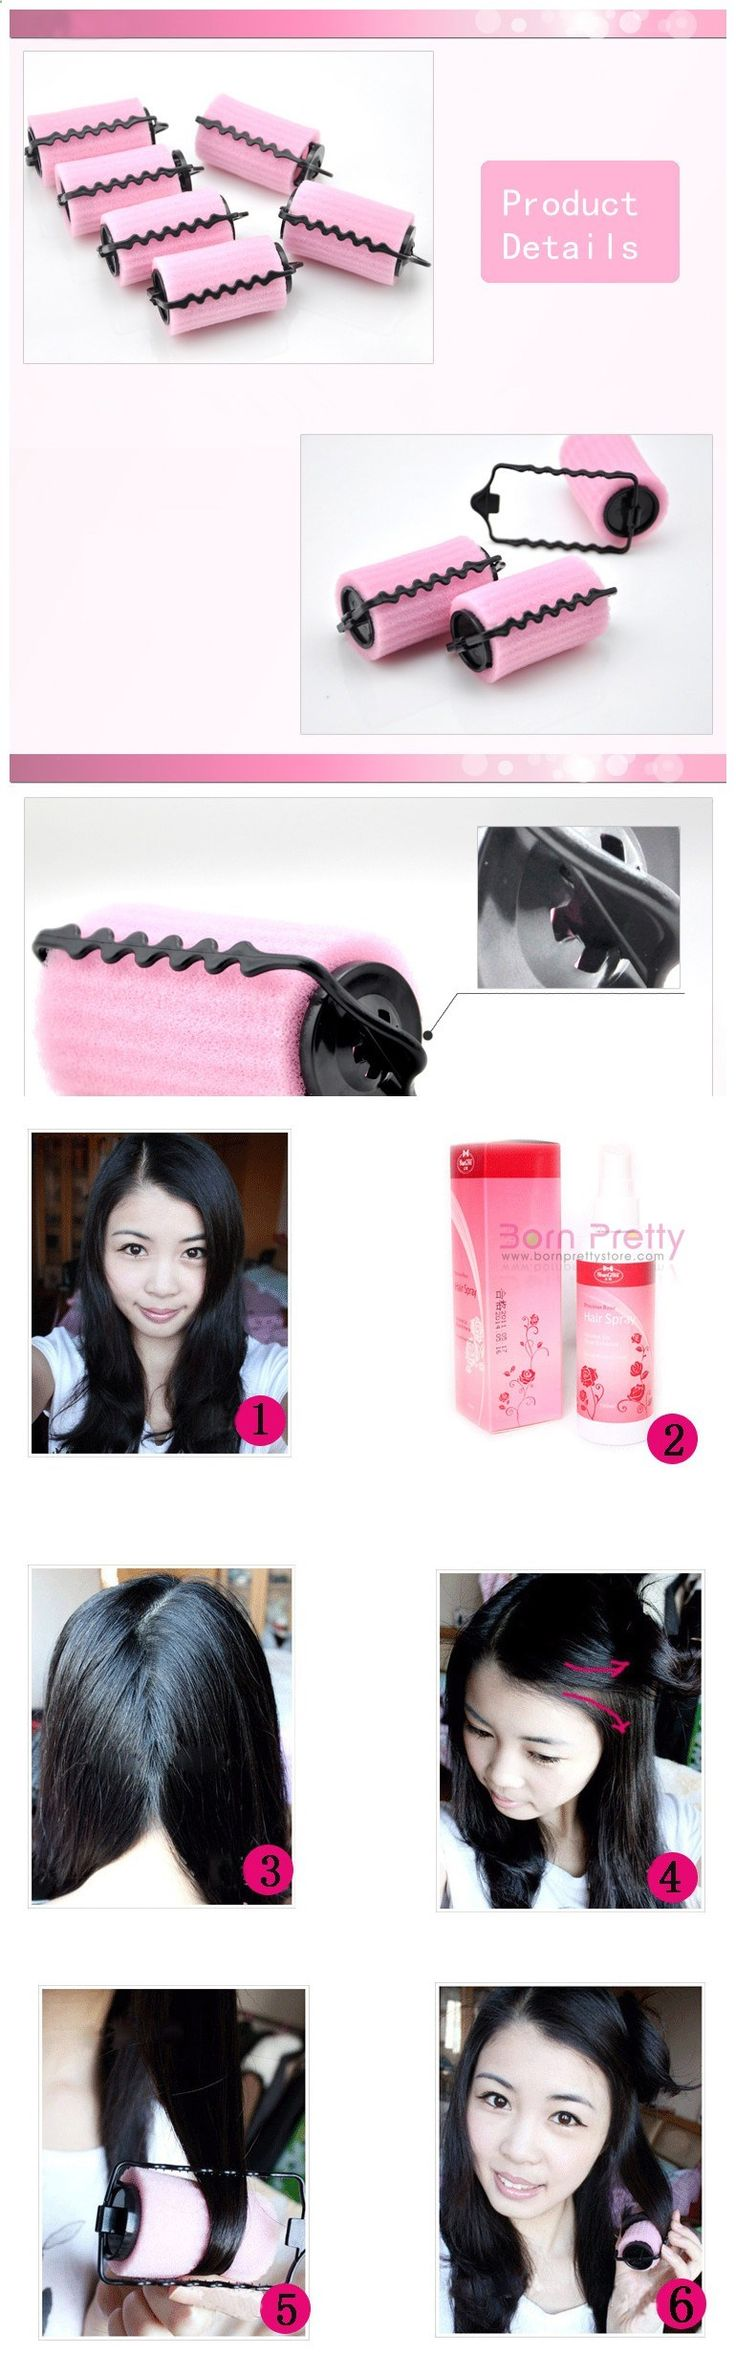 $3.48 6 pcs Lovely Lady Soft Sponge DIY Hair Curler Curling Rollers - BornPrettyStore.com